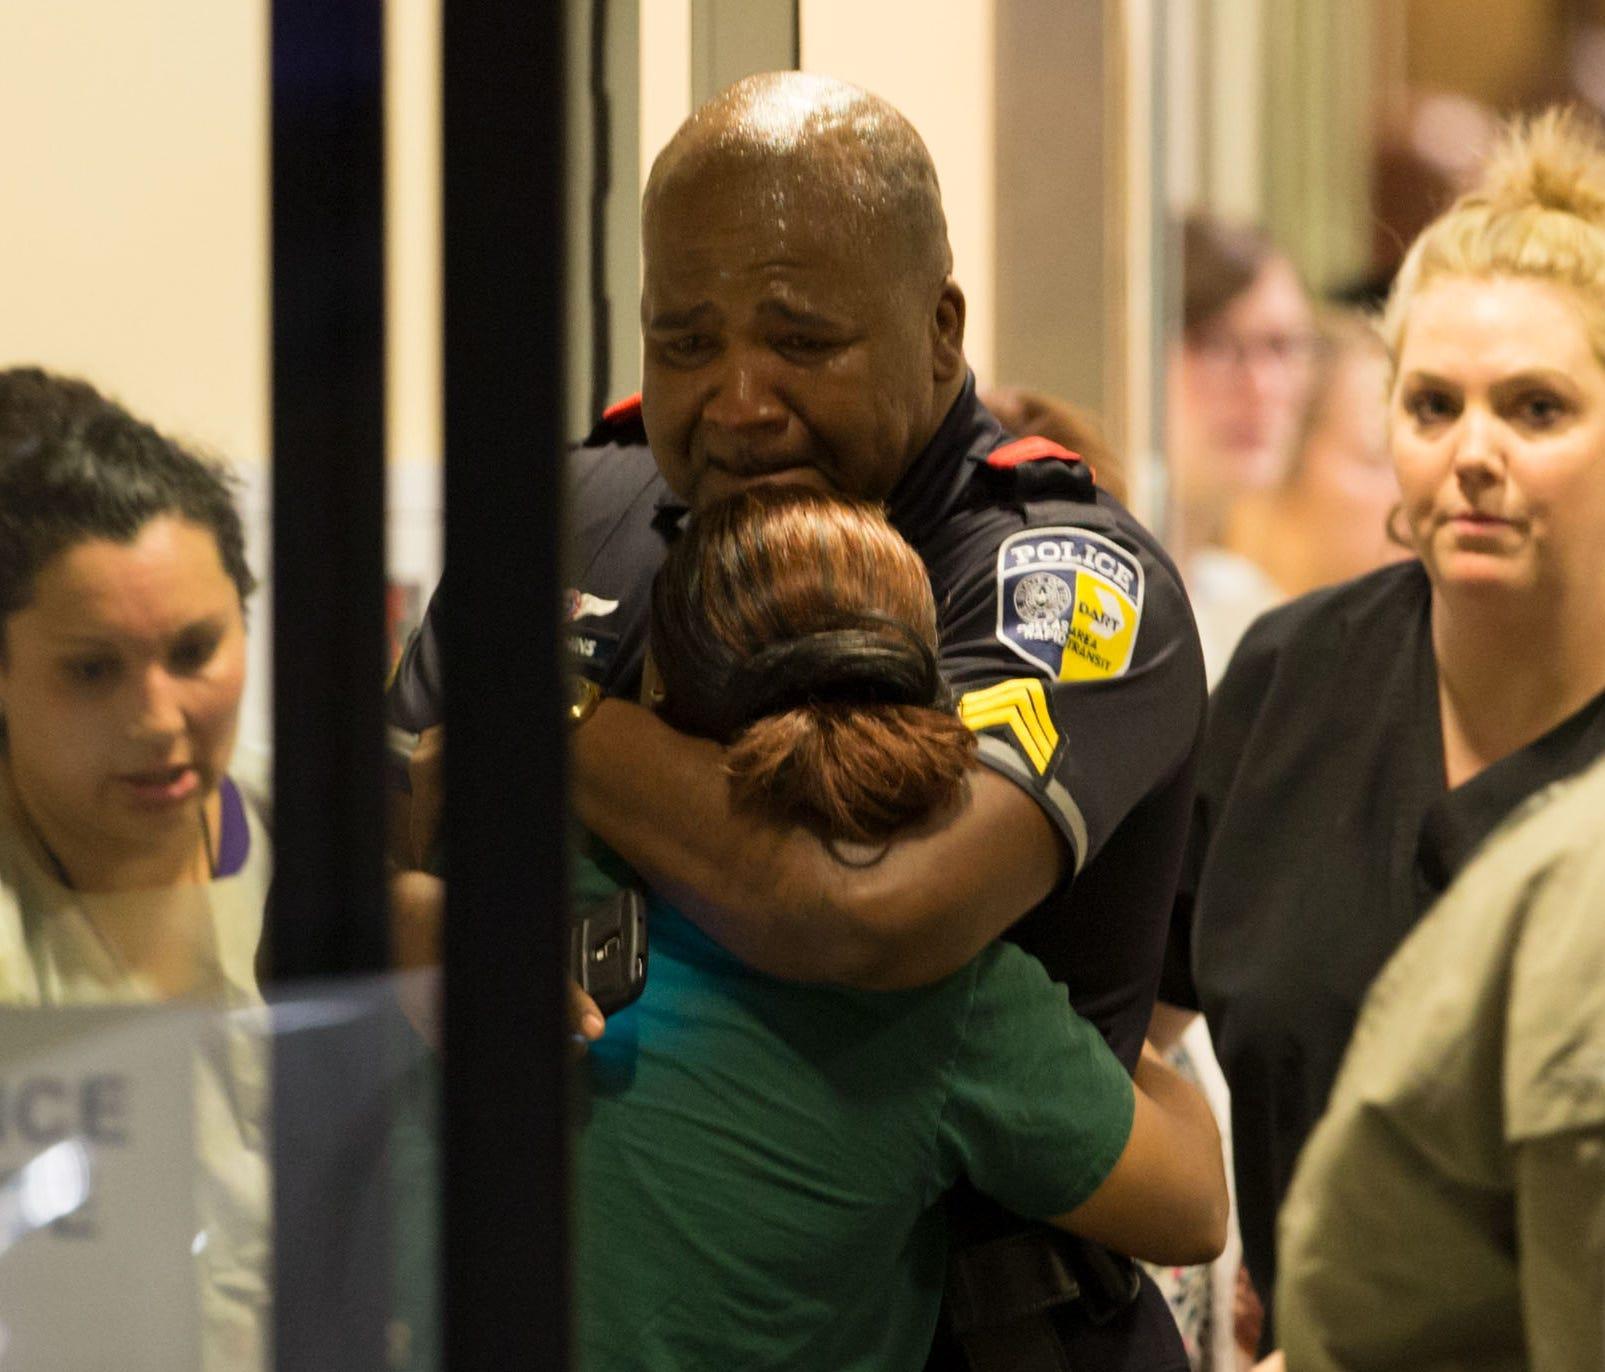 Bomb Making Material Ballistic Vests Rifles Found In Dallas Gunman S Home Whas11 Com